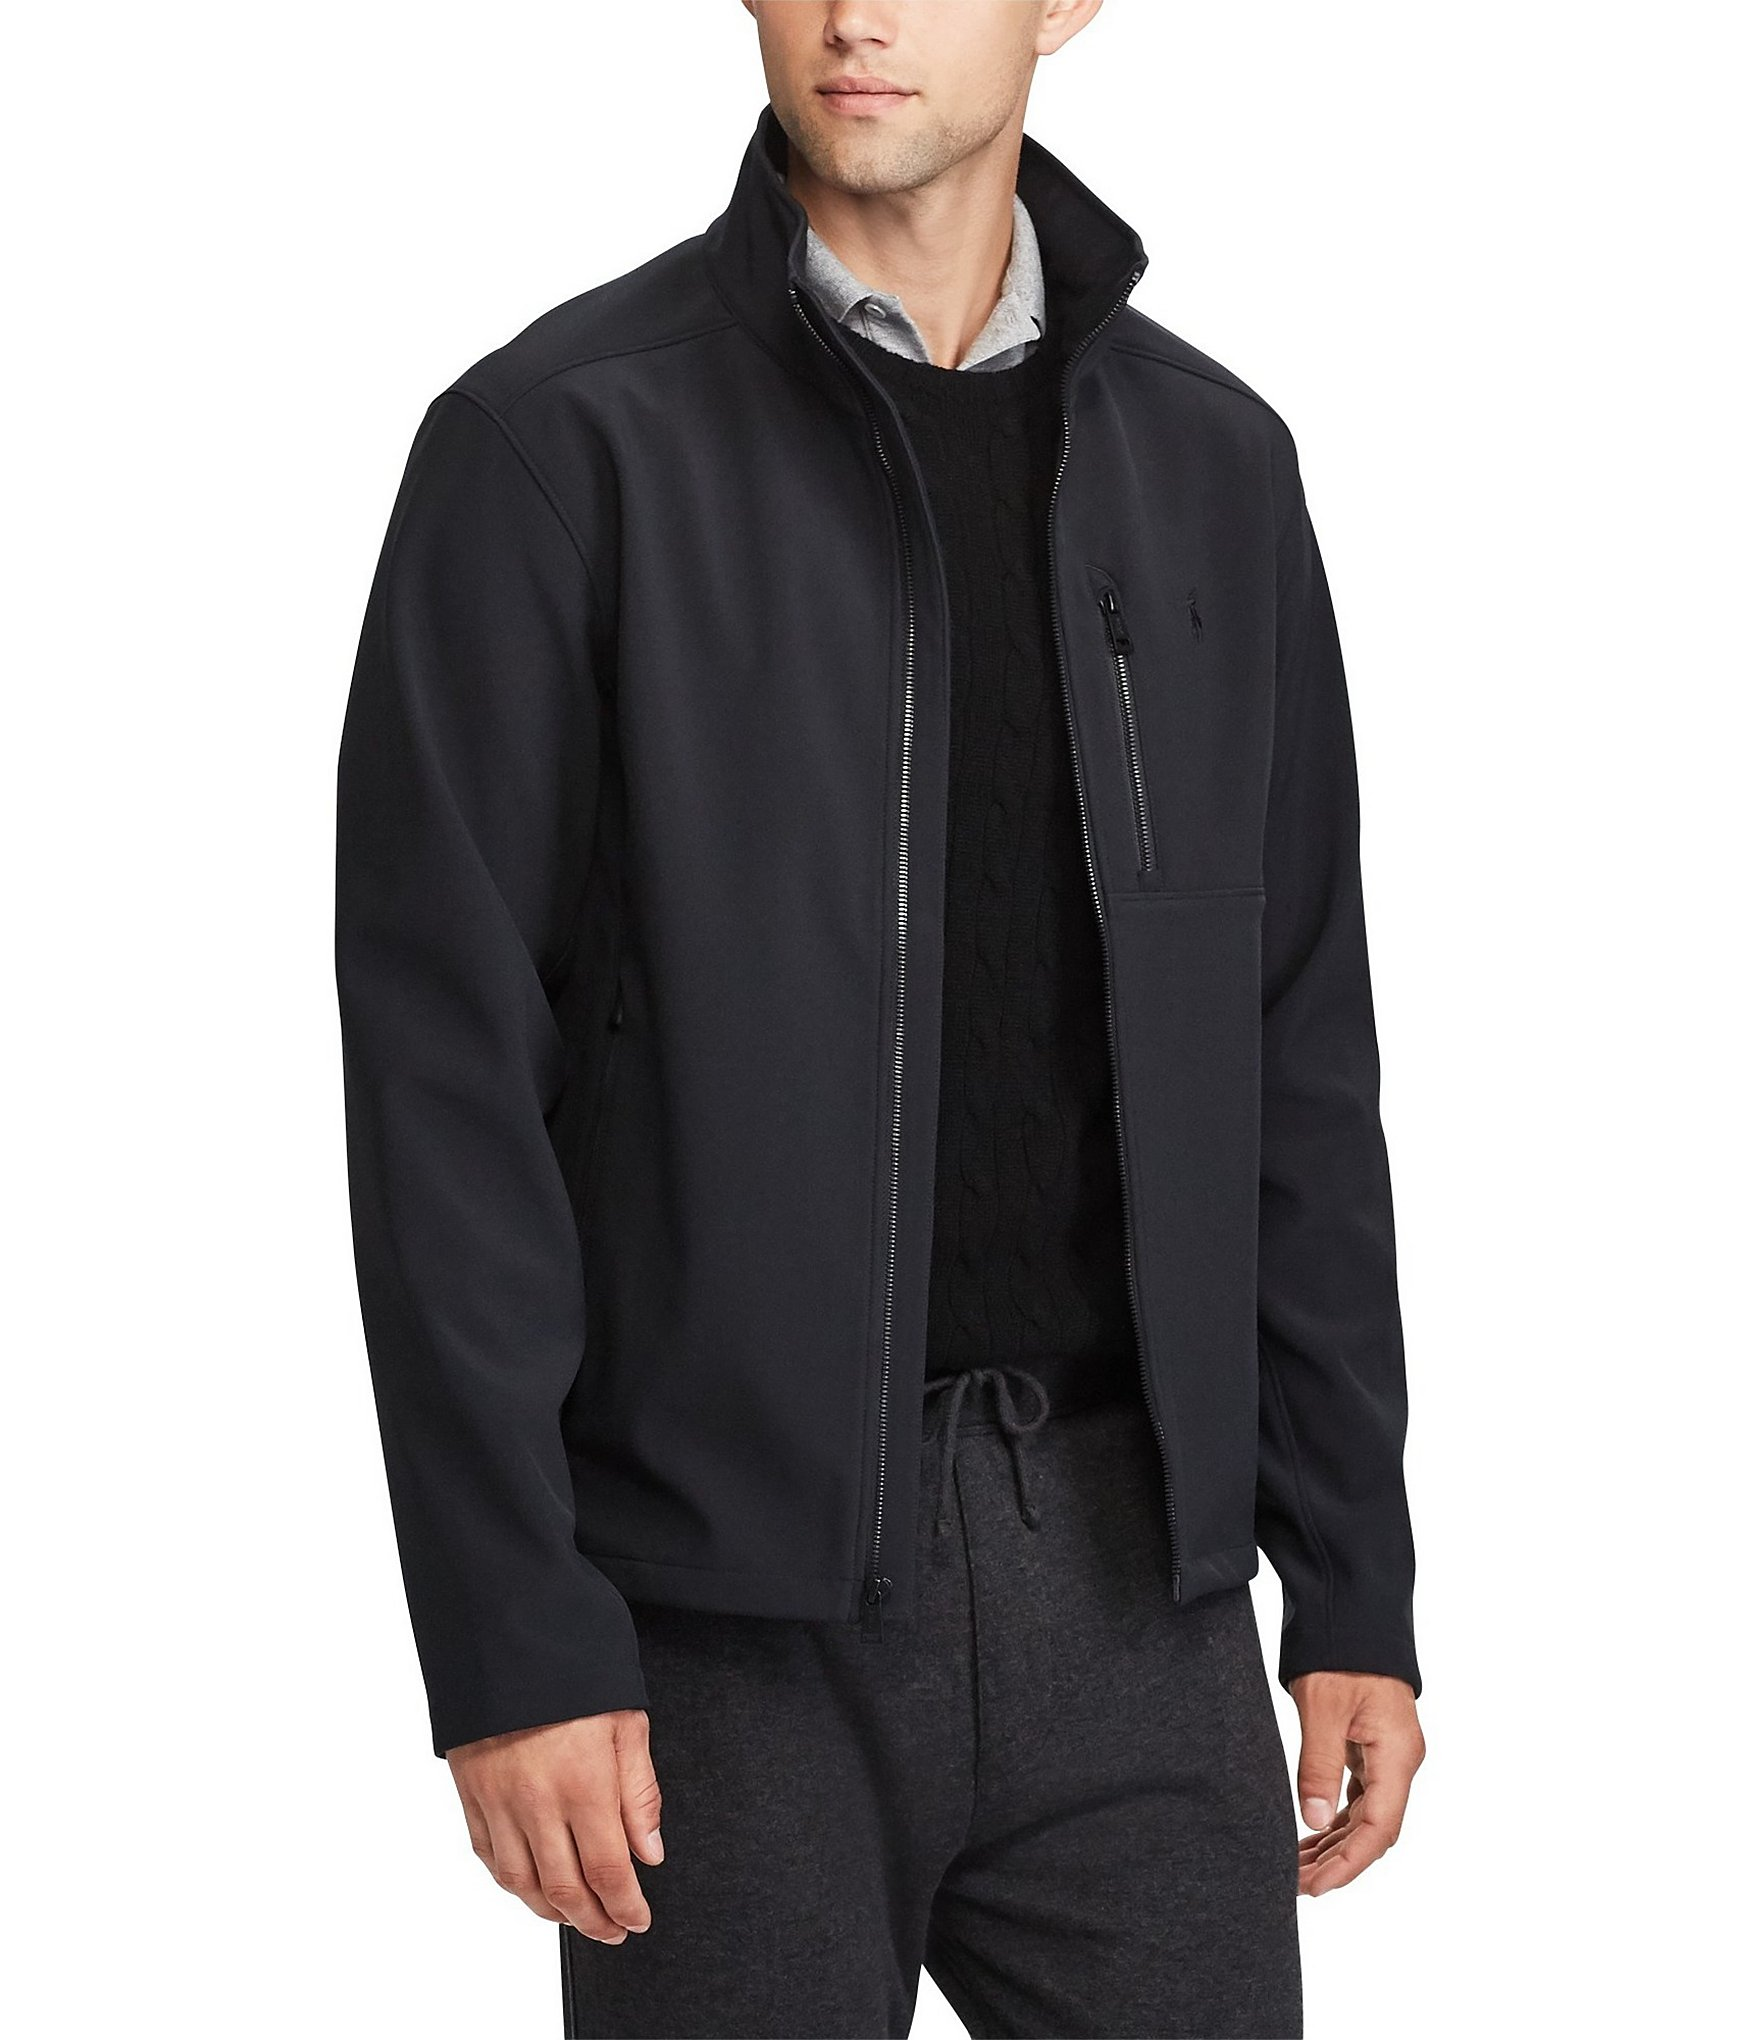 polo ralph lauren water repellent jacket dillards. Black Bedroom Furniture Sets. Home Design Ideas